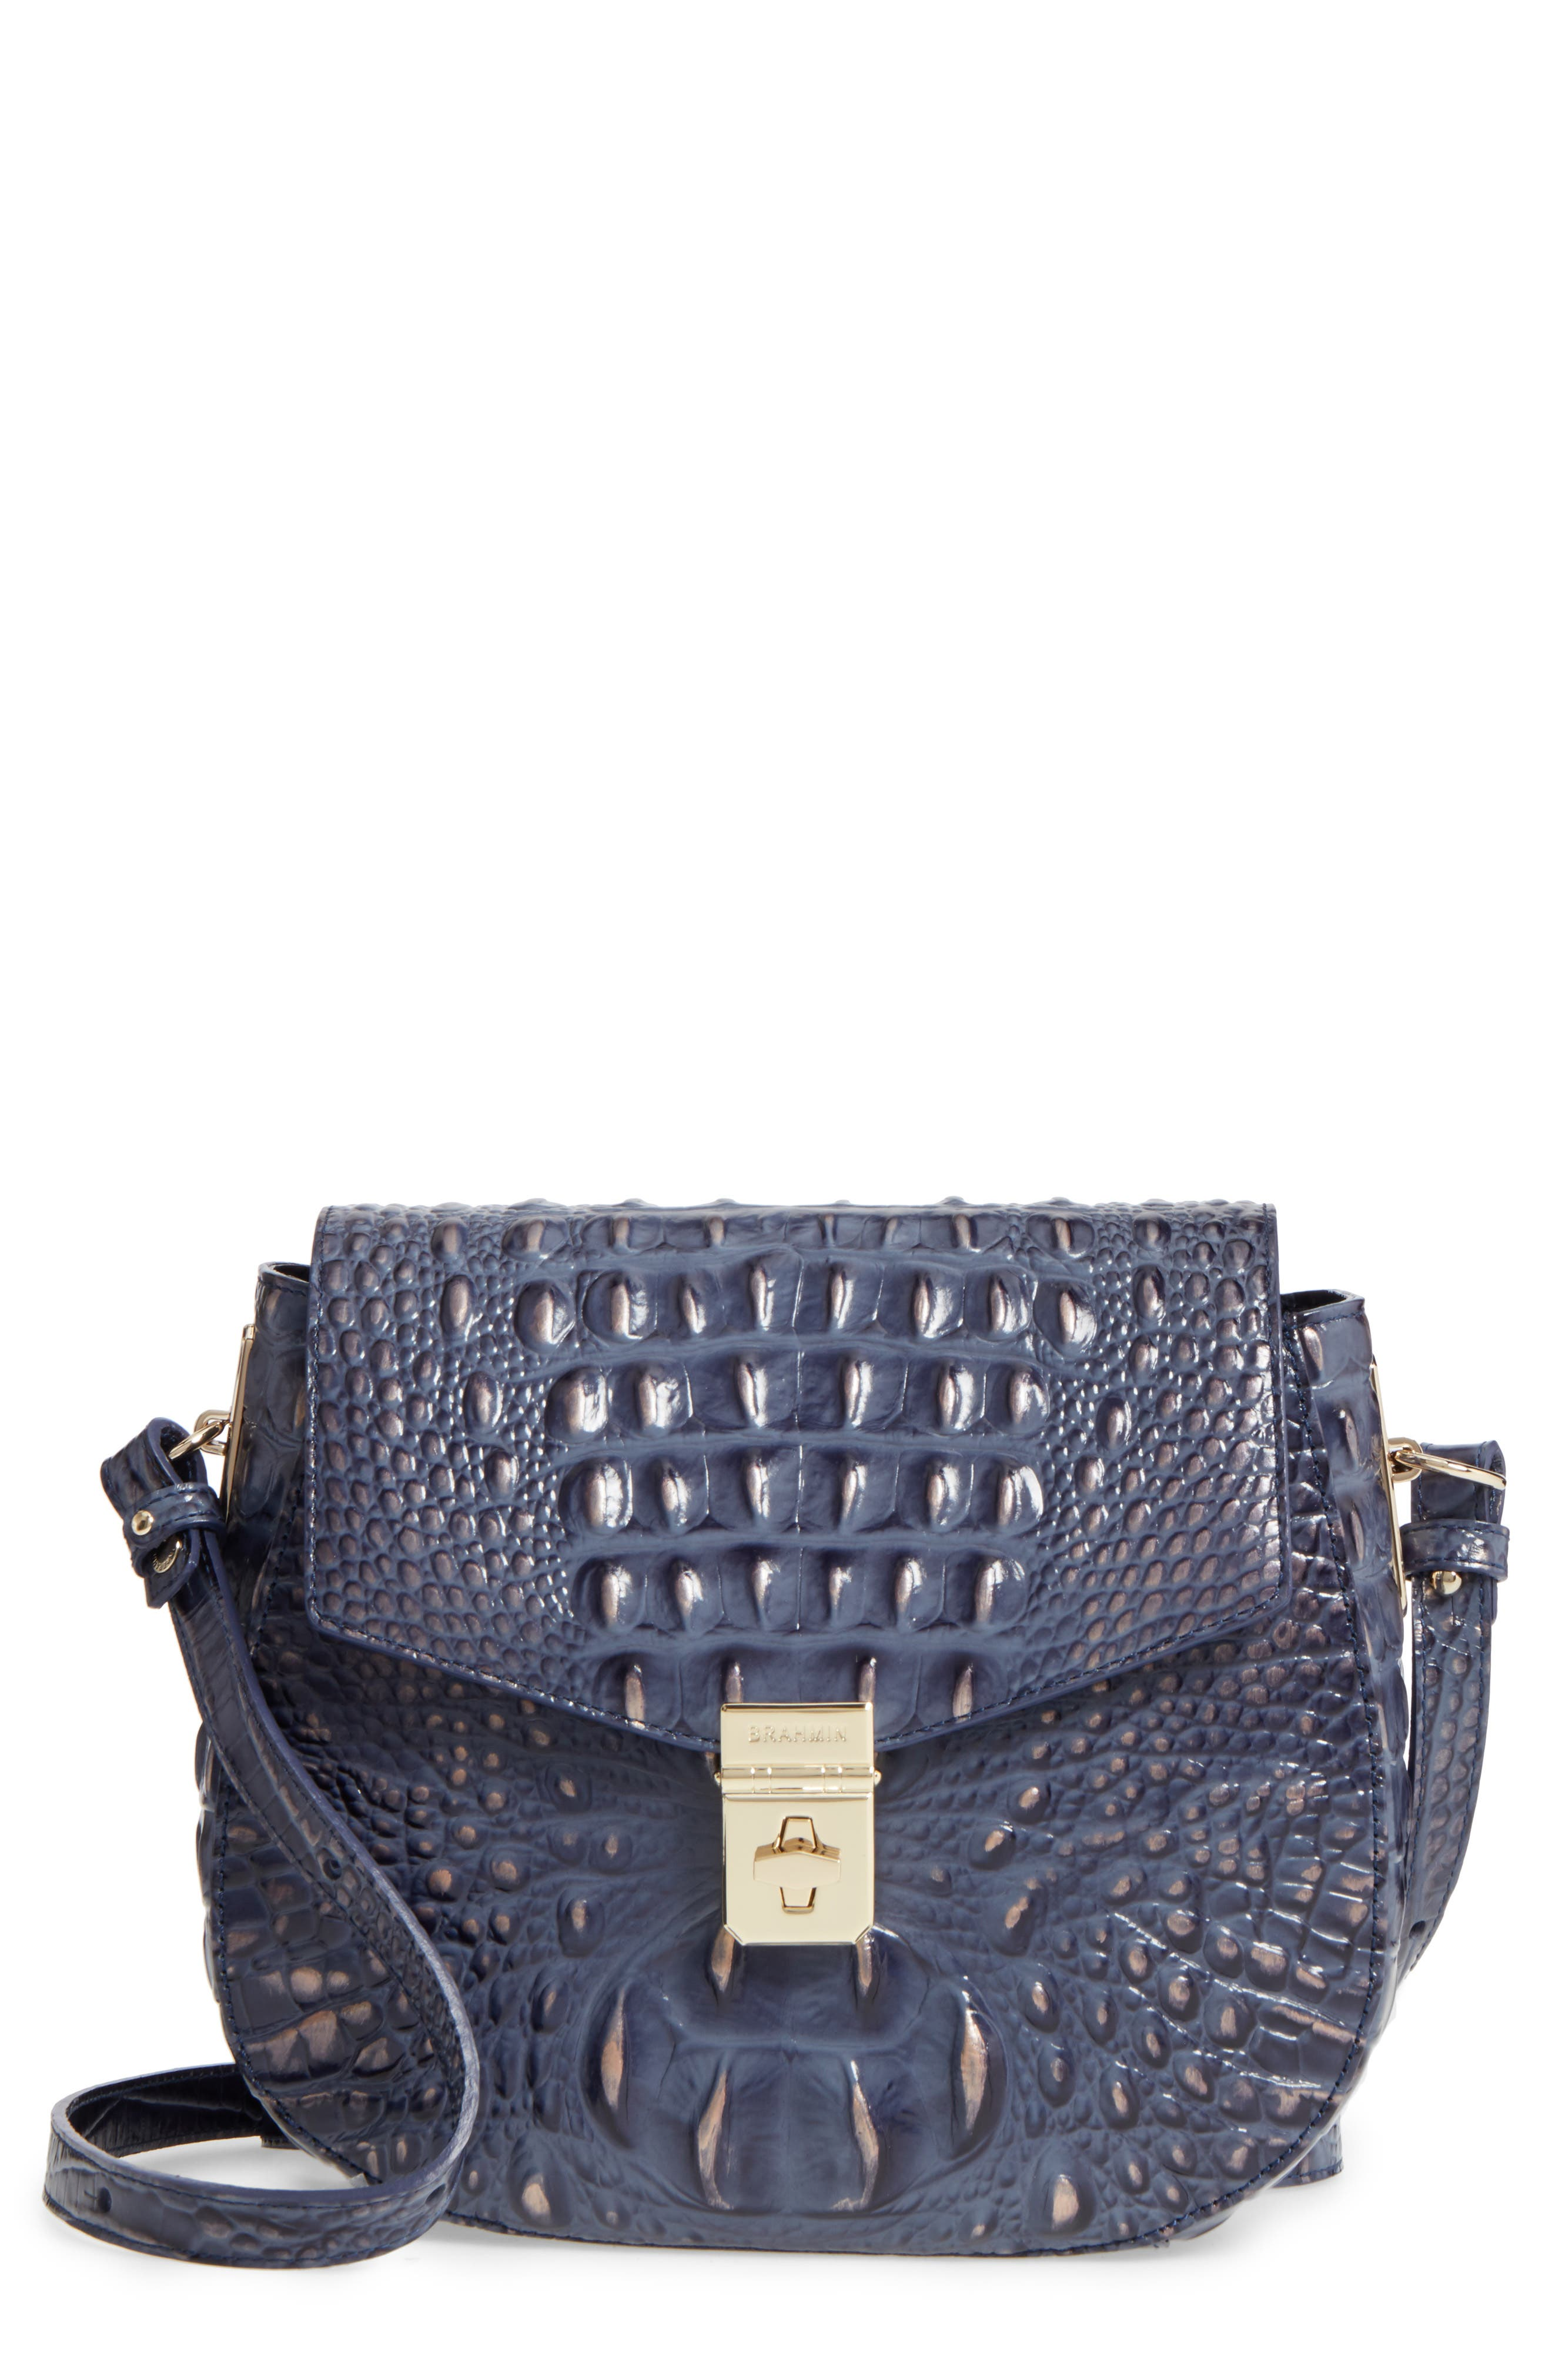 Brahmin Melbourne - Lizzie Leather Crossbody Bag